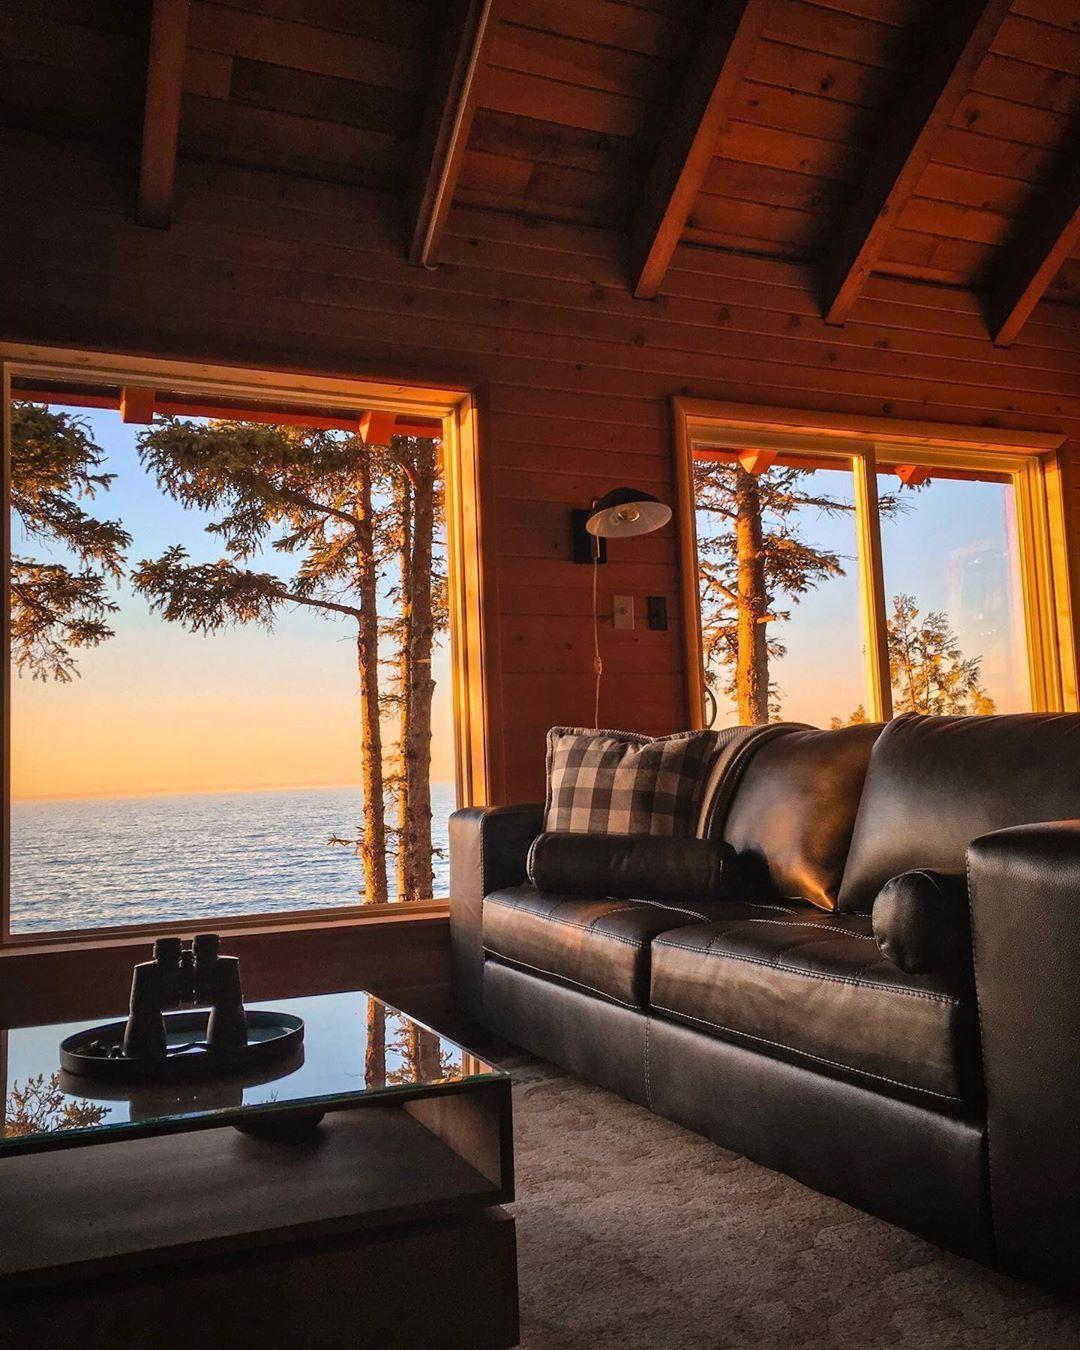 Pin by Autumn Jacunski on Lake camp Old cabins, Design